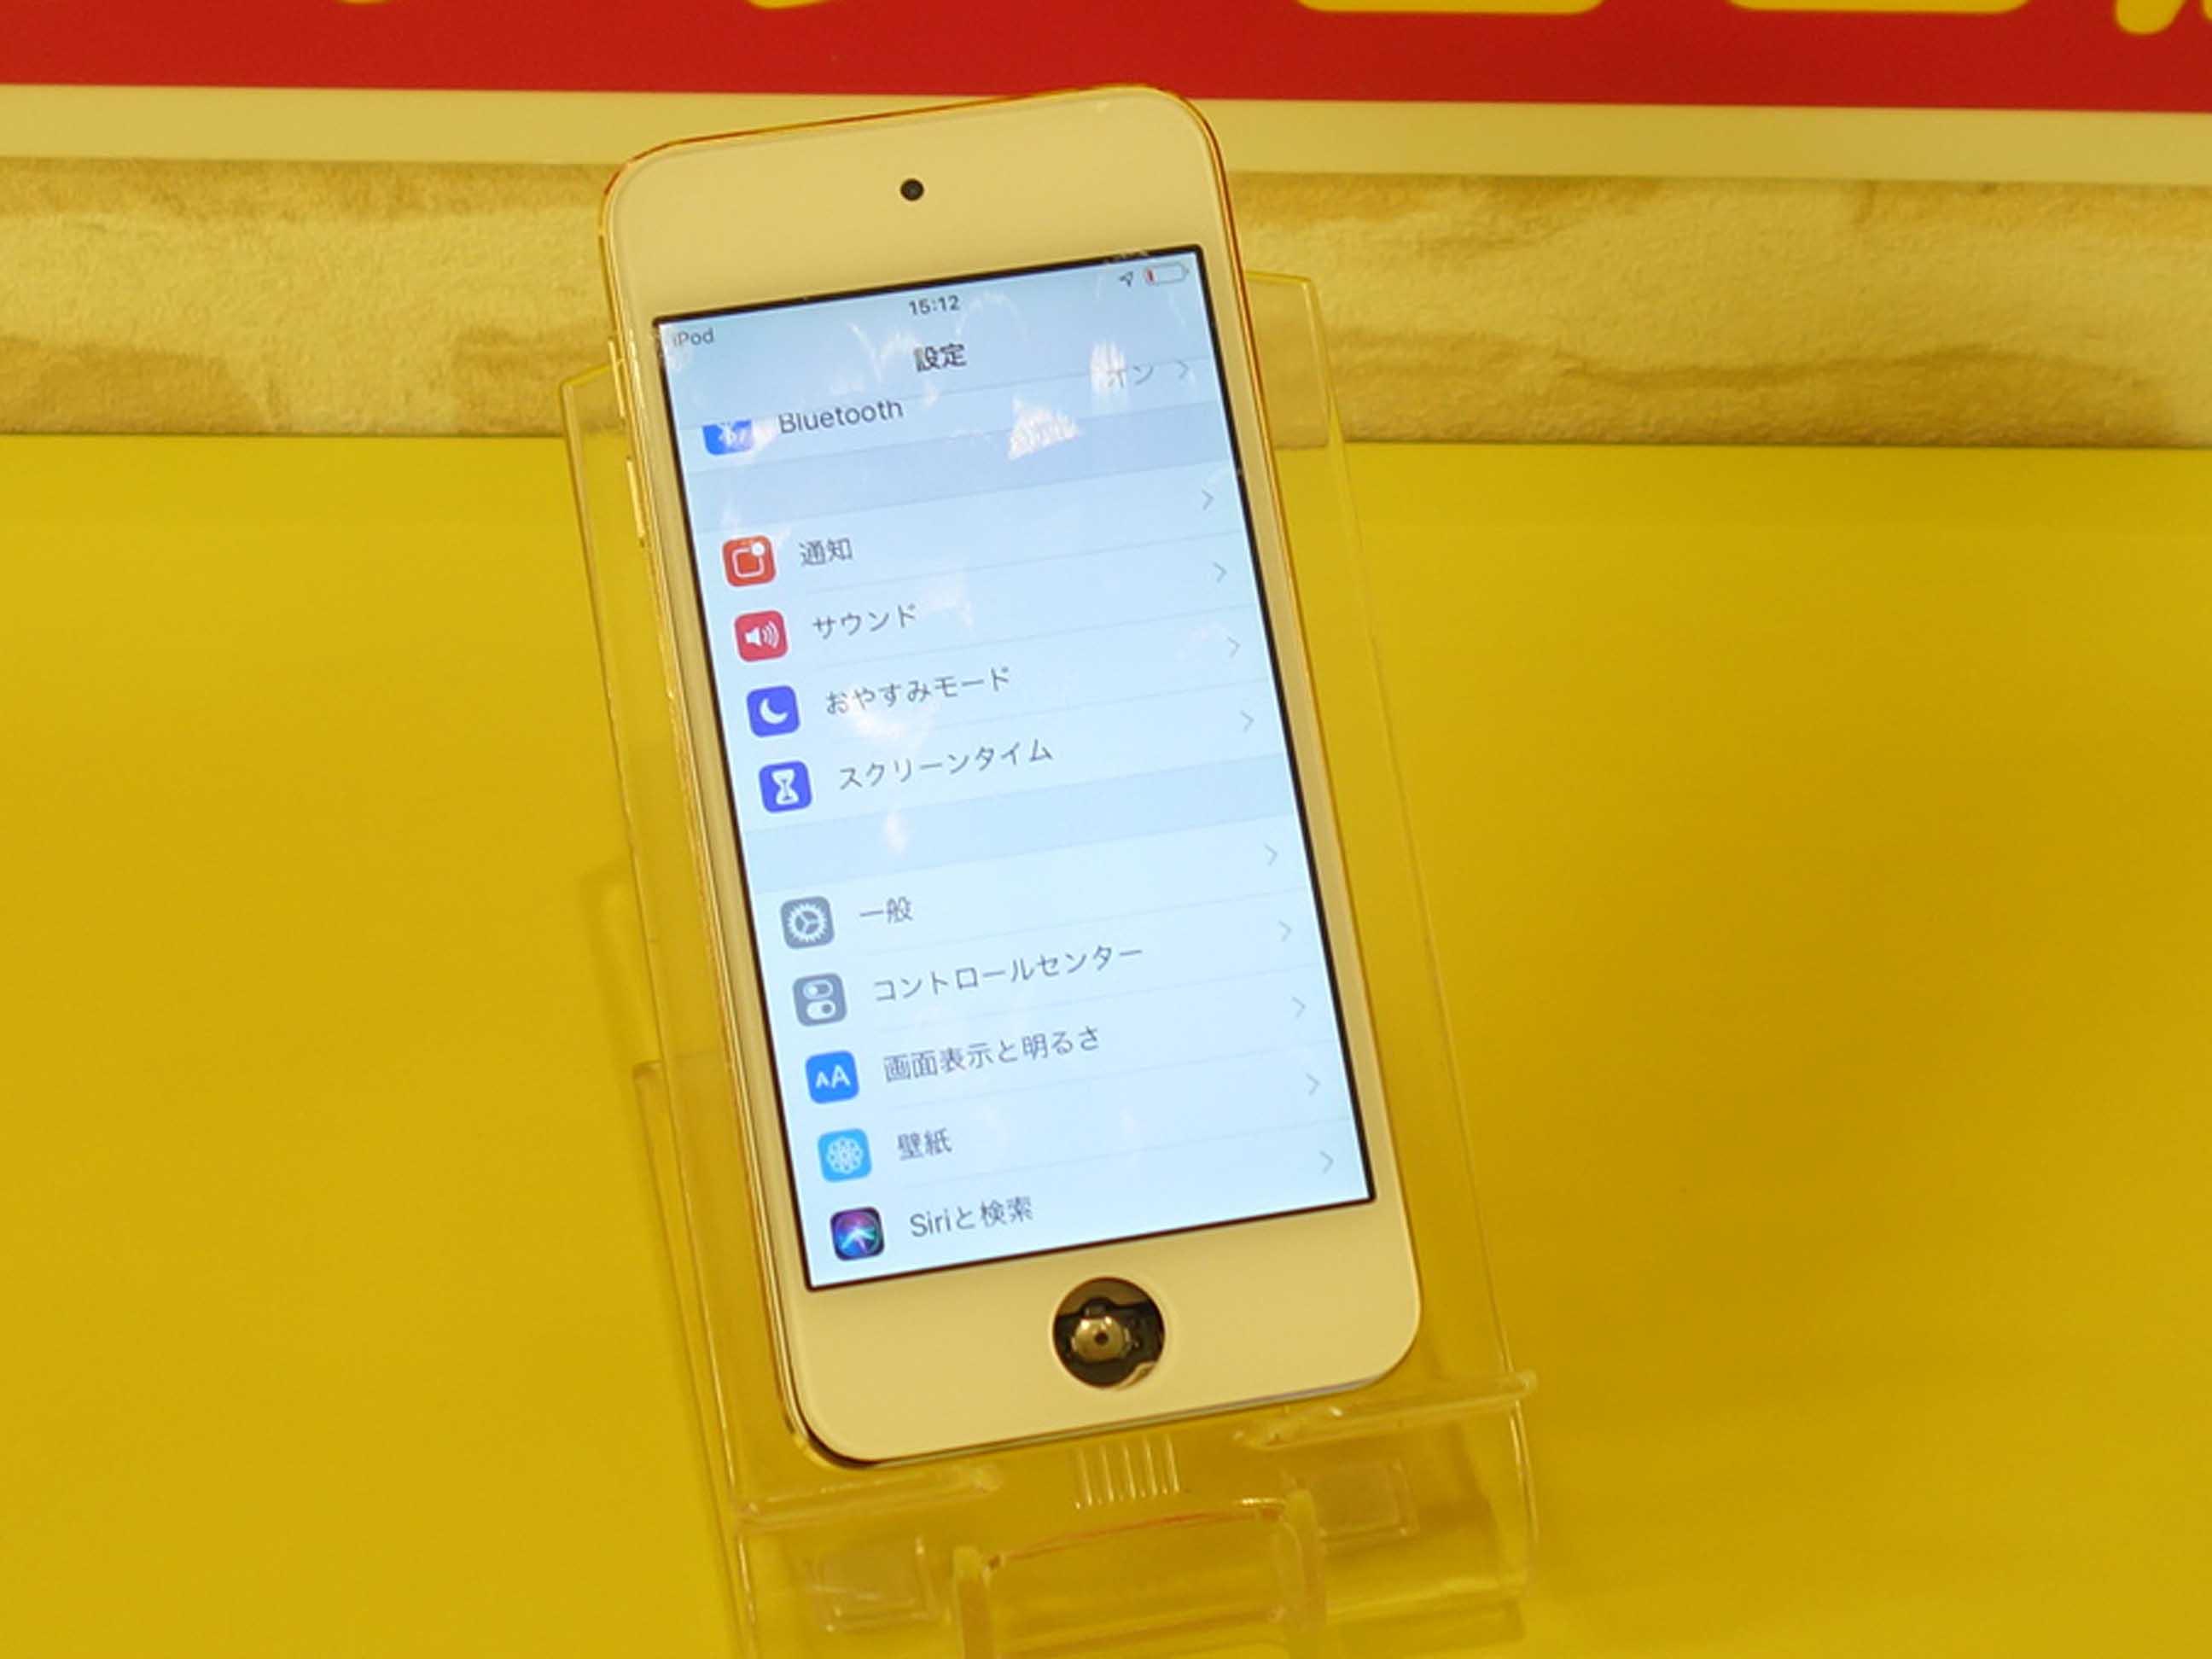 iPod Touch6のバッテリー交換修理で春日井市からご来店!アイポッド修理もクイック名古屋